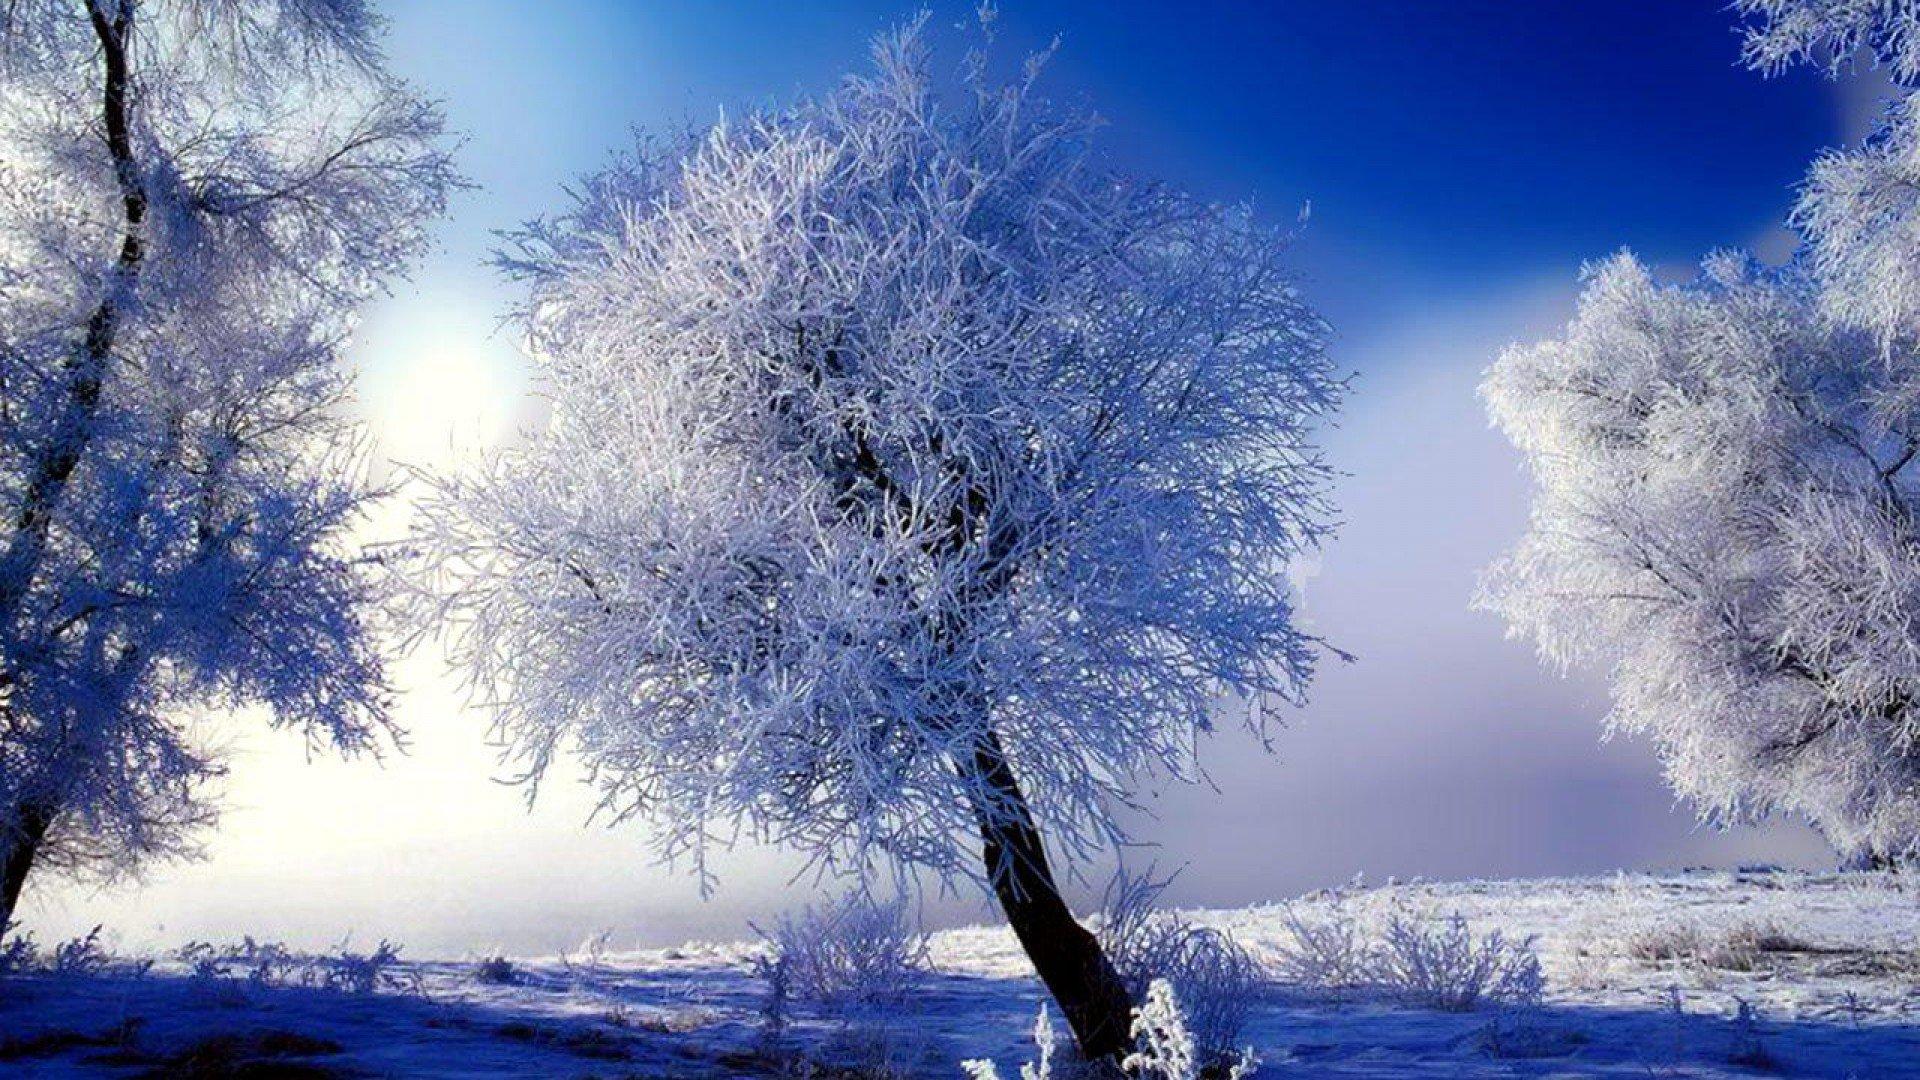 christmas scenery free download hd snowy christmas scene 1920x1080